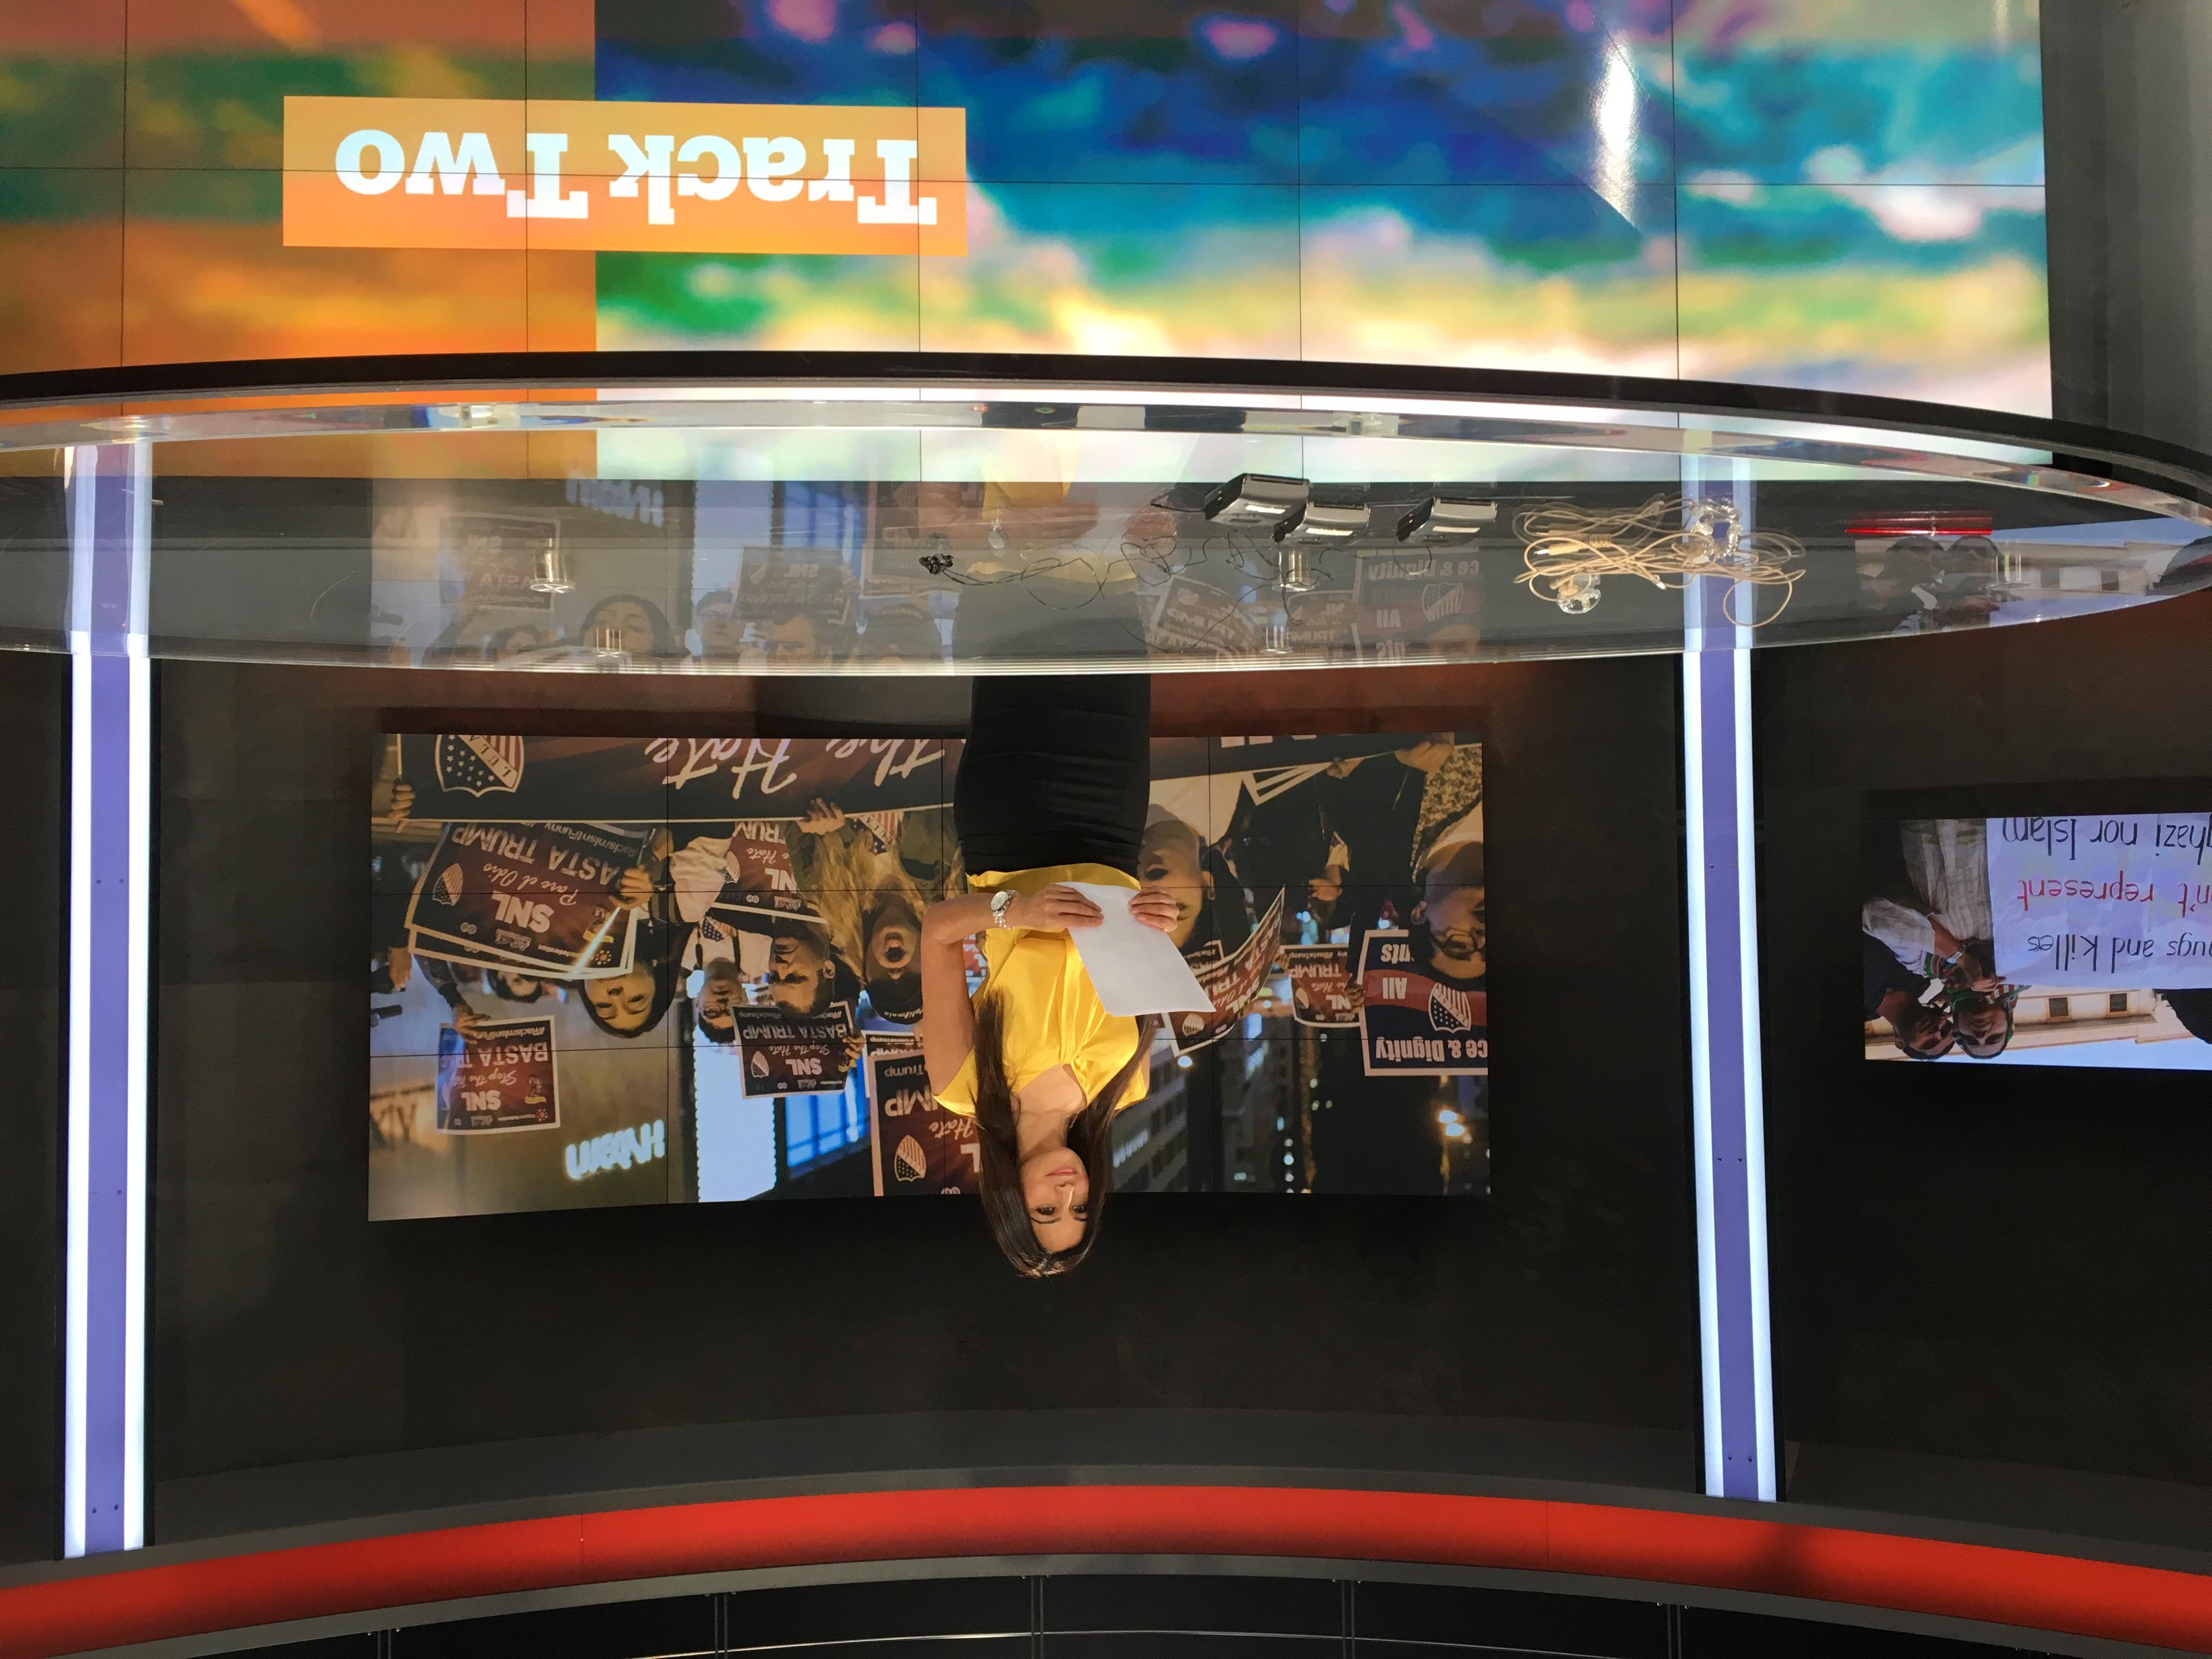 5. Istanbul Talk Show Host